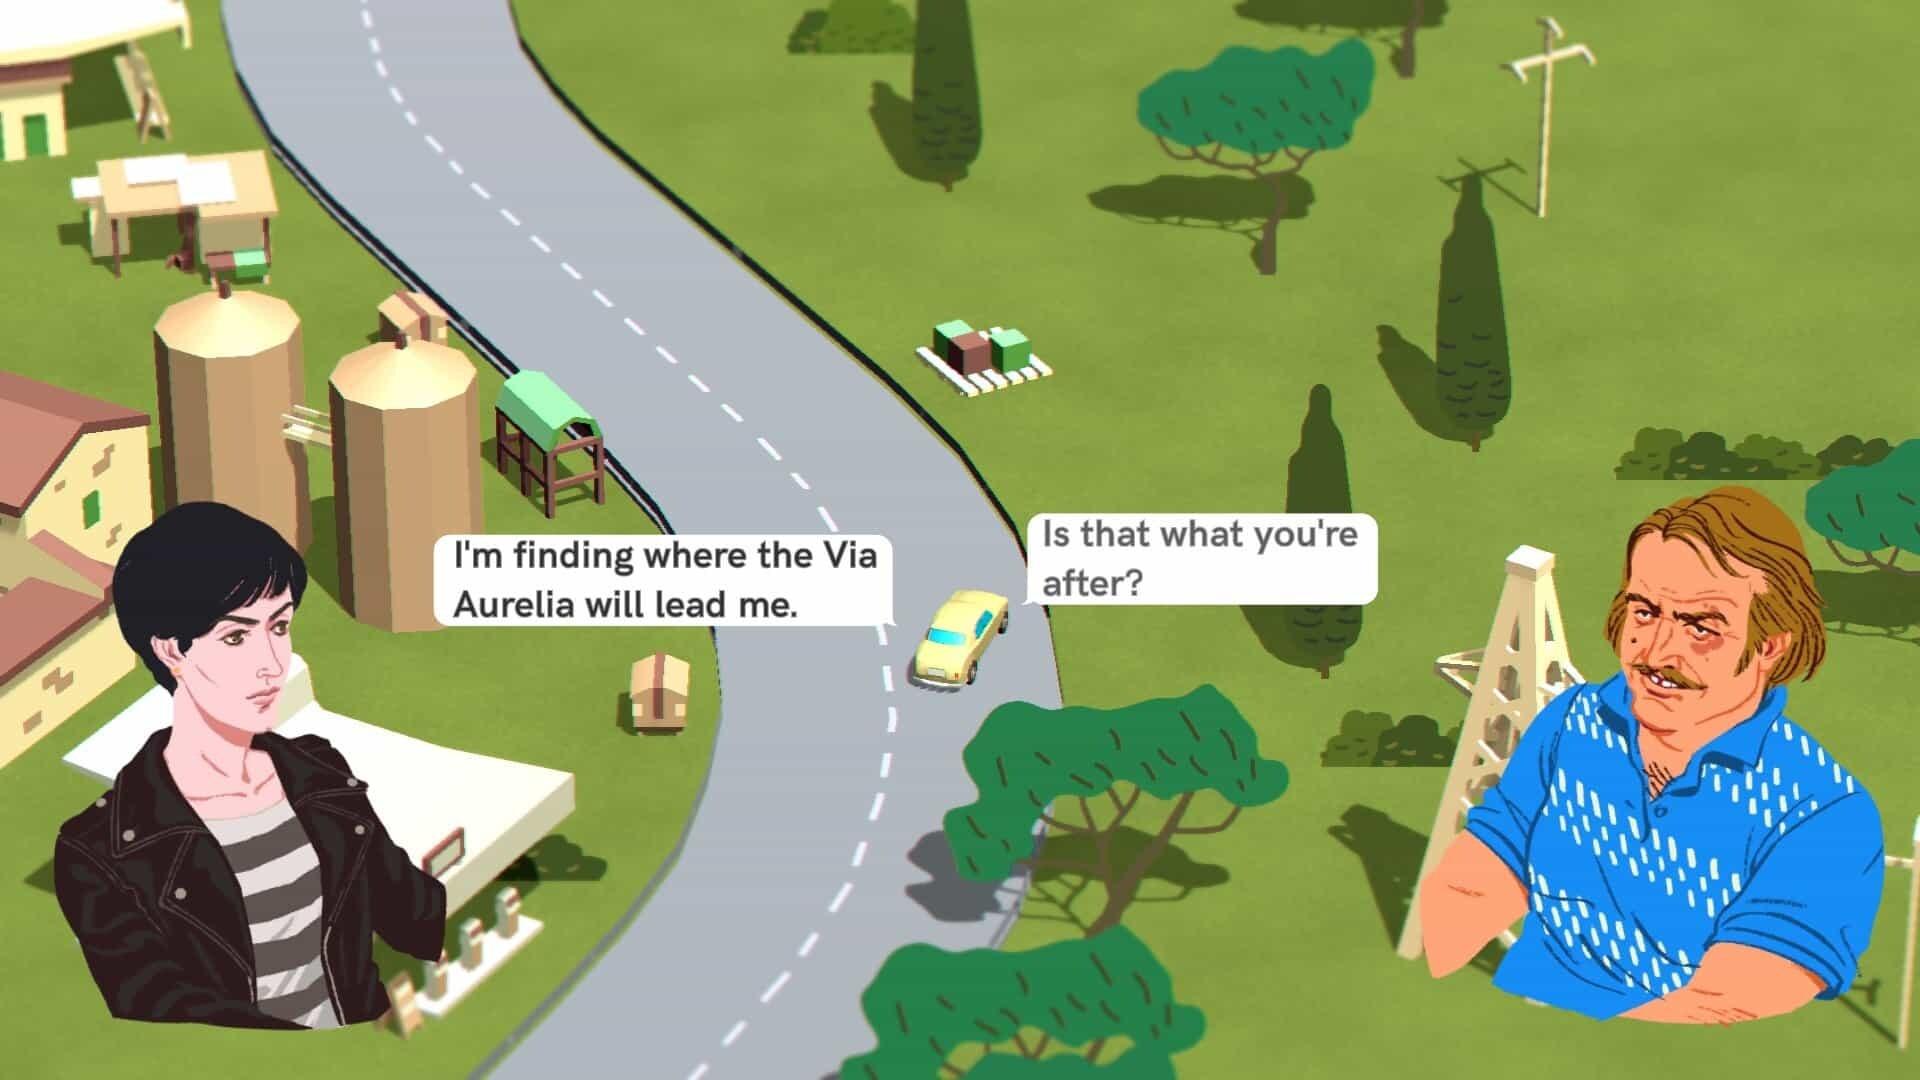 Wheels of Aurelia game screenshot, driving and talking